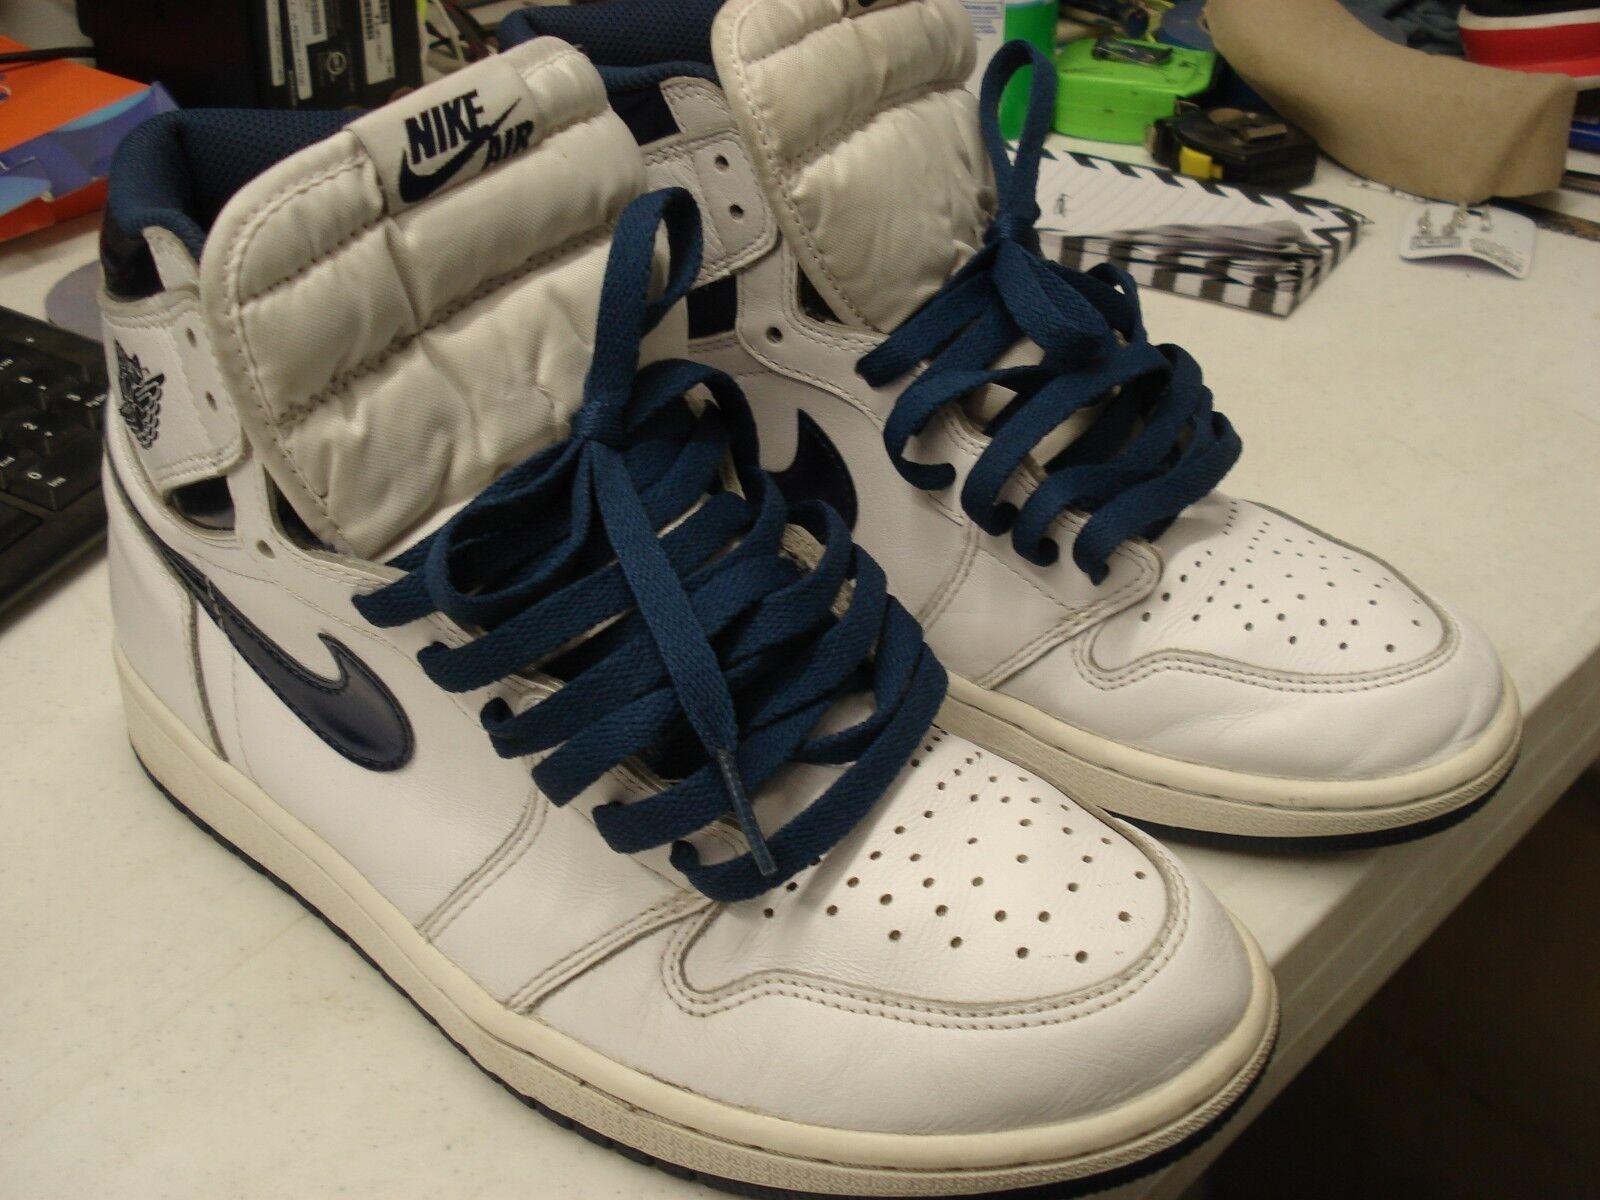 Men's Nike Air Jordan 1 Retro Two Tone White bluee 555088-106 Size 9